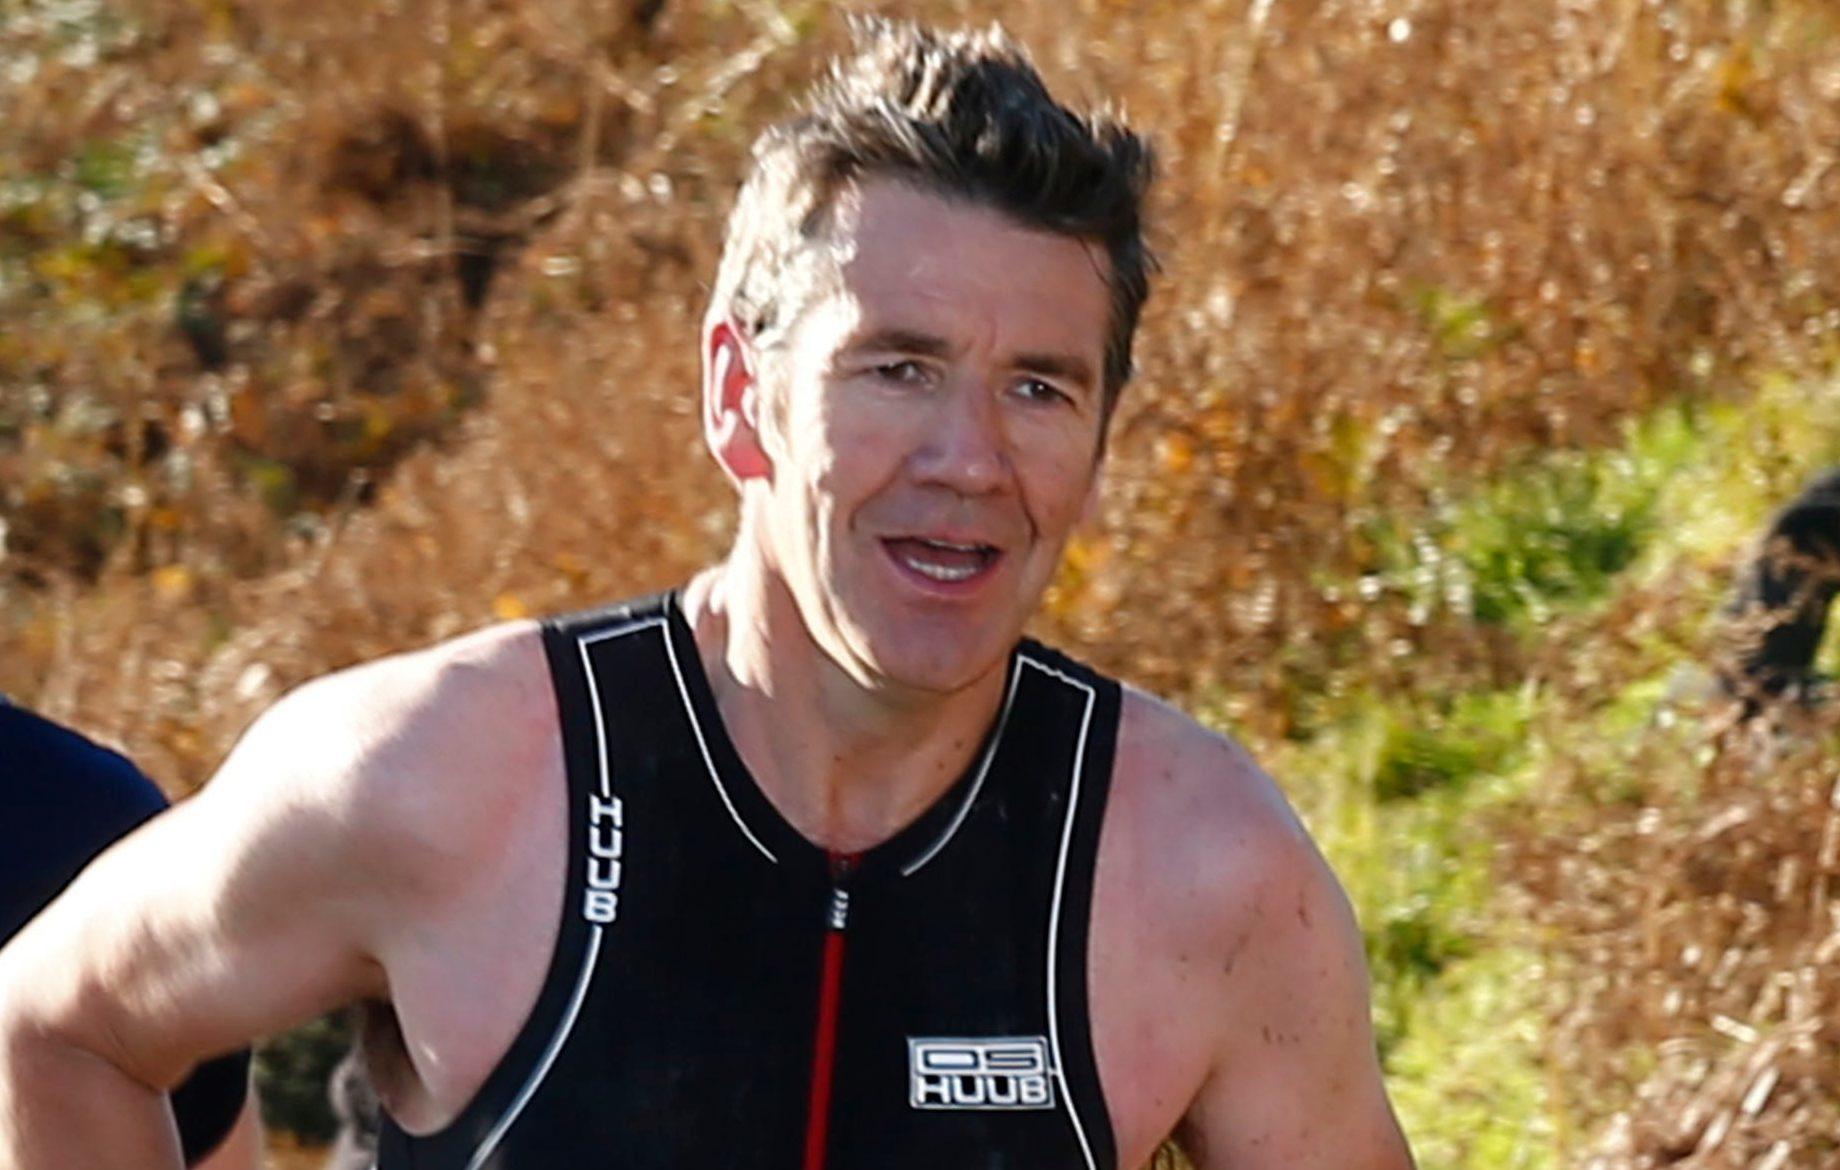 Dougie Vipond competing in The Craggy Island Triathlon on Kerrera (Stephen Lawson / Edinburgh Elite media)